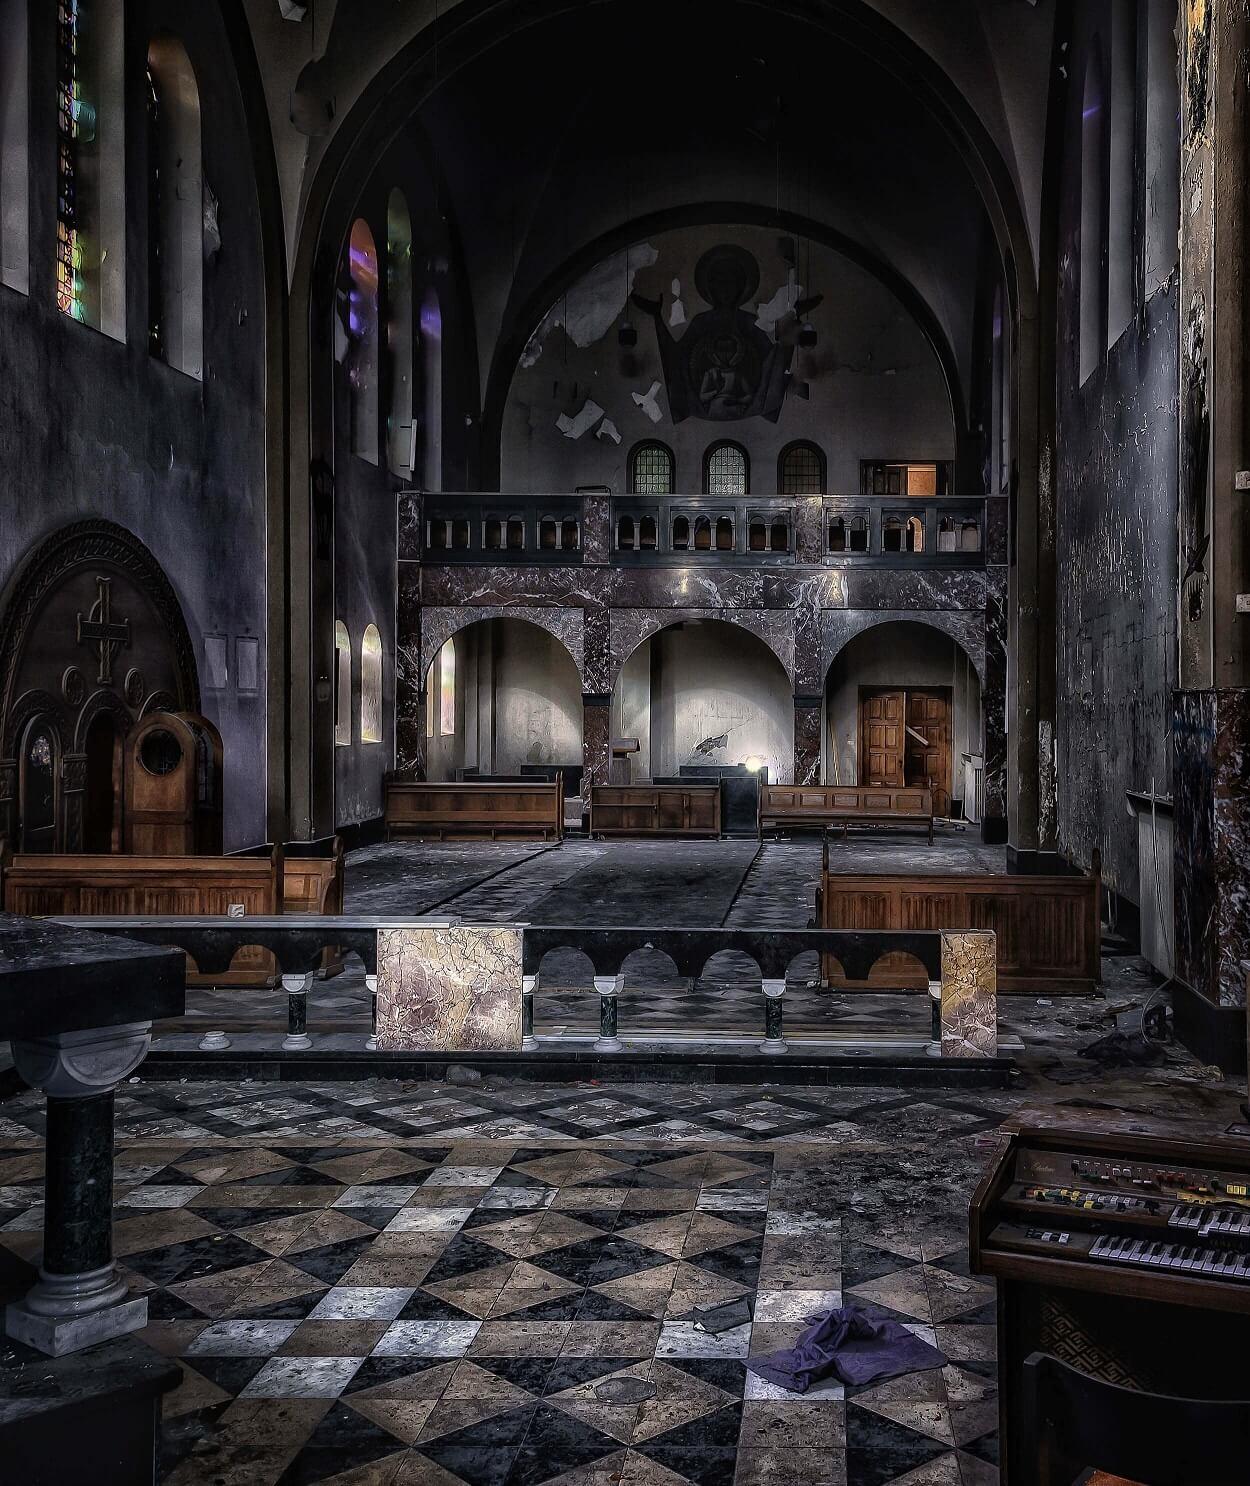 The Broken Church